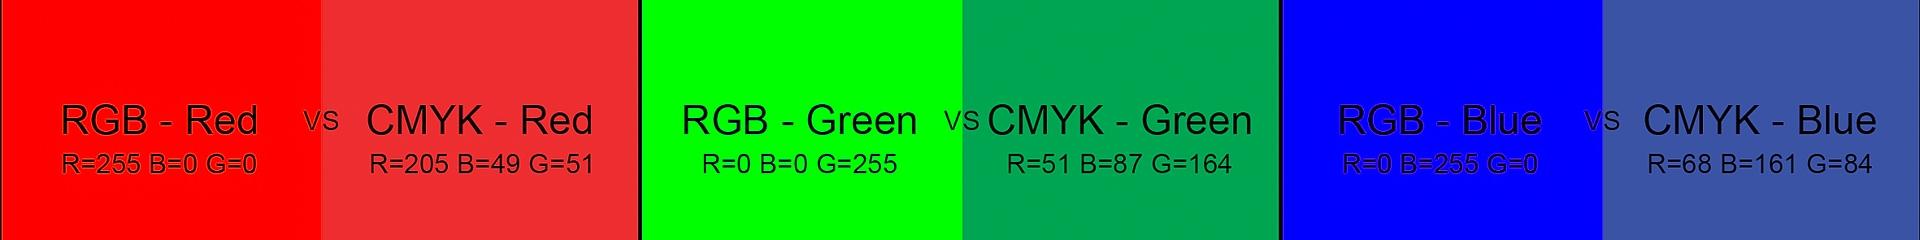 Img - 02 - CMYK colour